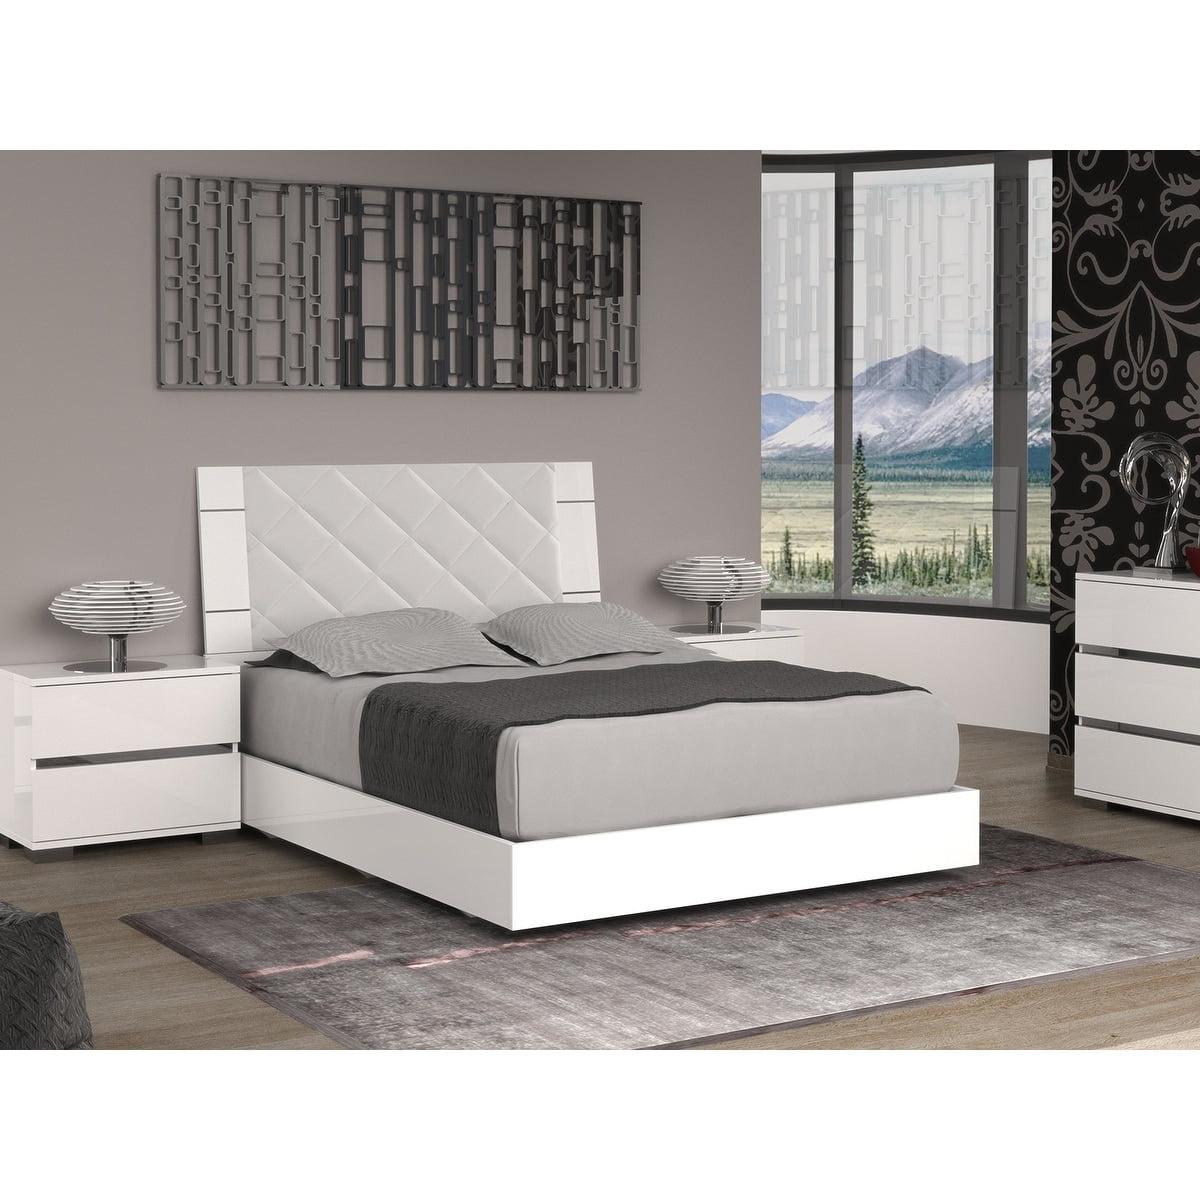 Casabianca Furniture Tc 9001 Kw Diamanti Eco Leather Headboard King Bed 44 Light Gray White Lacquer 49 5 X 80 X 85 In Walmart Com Walmart Com